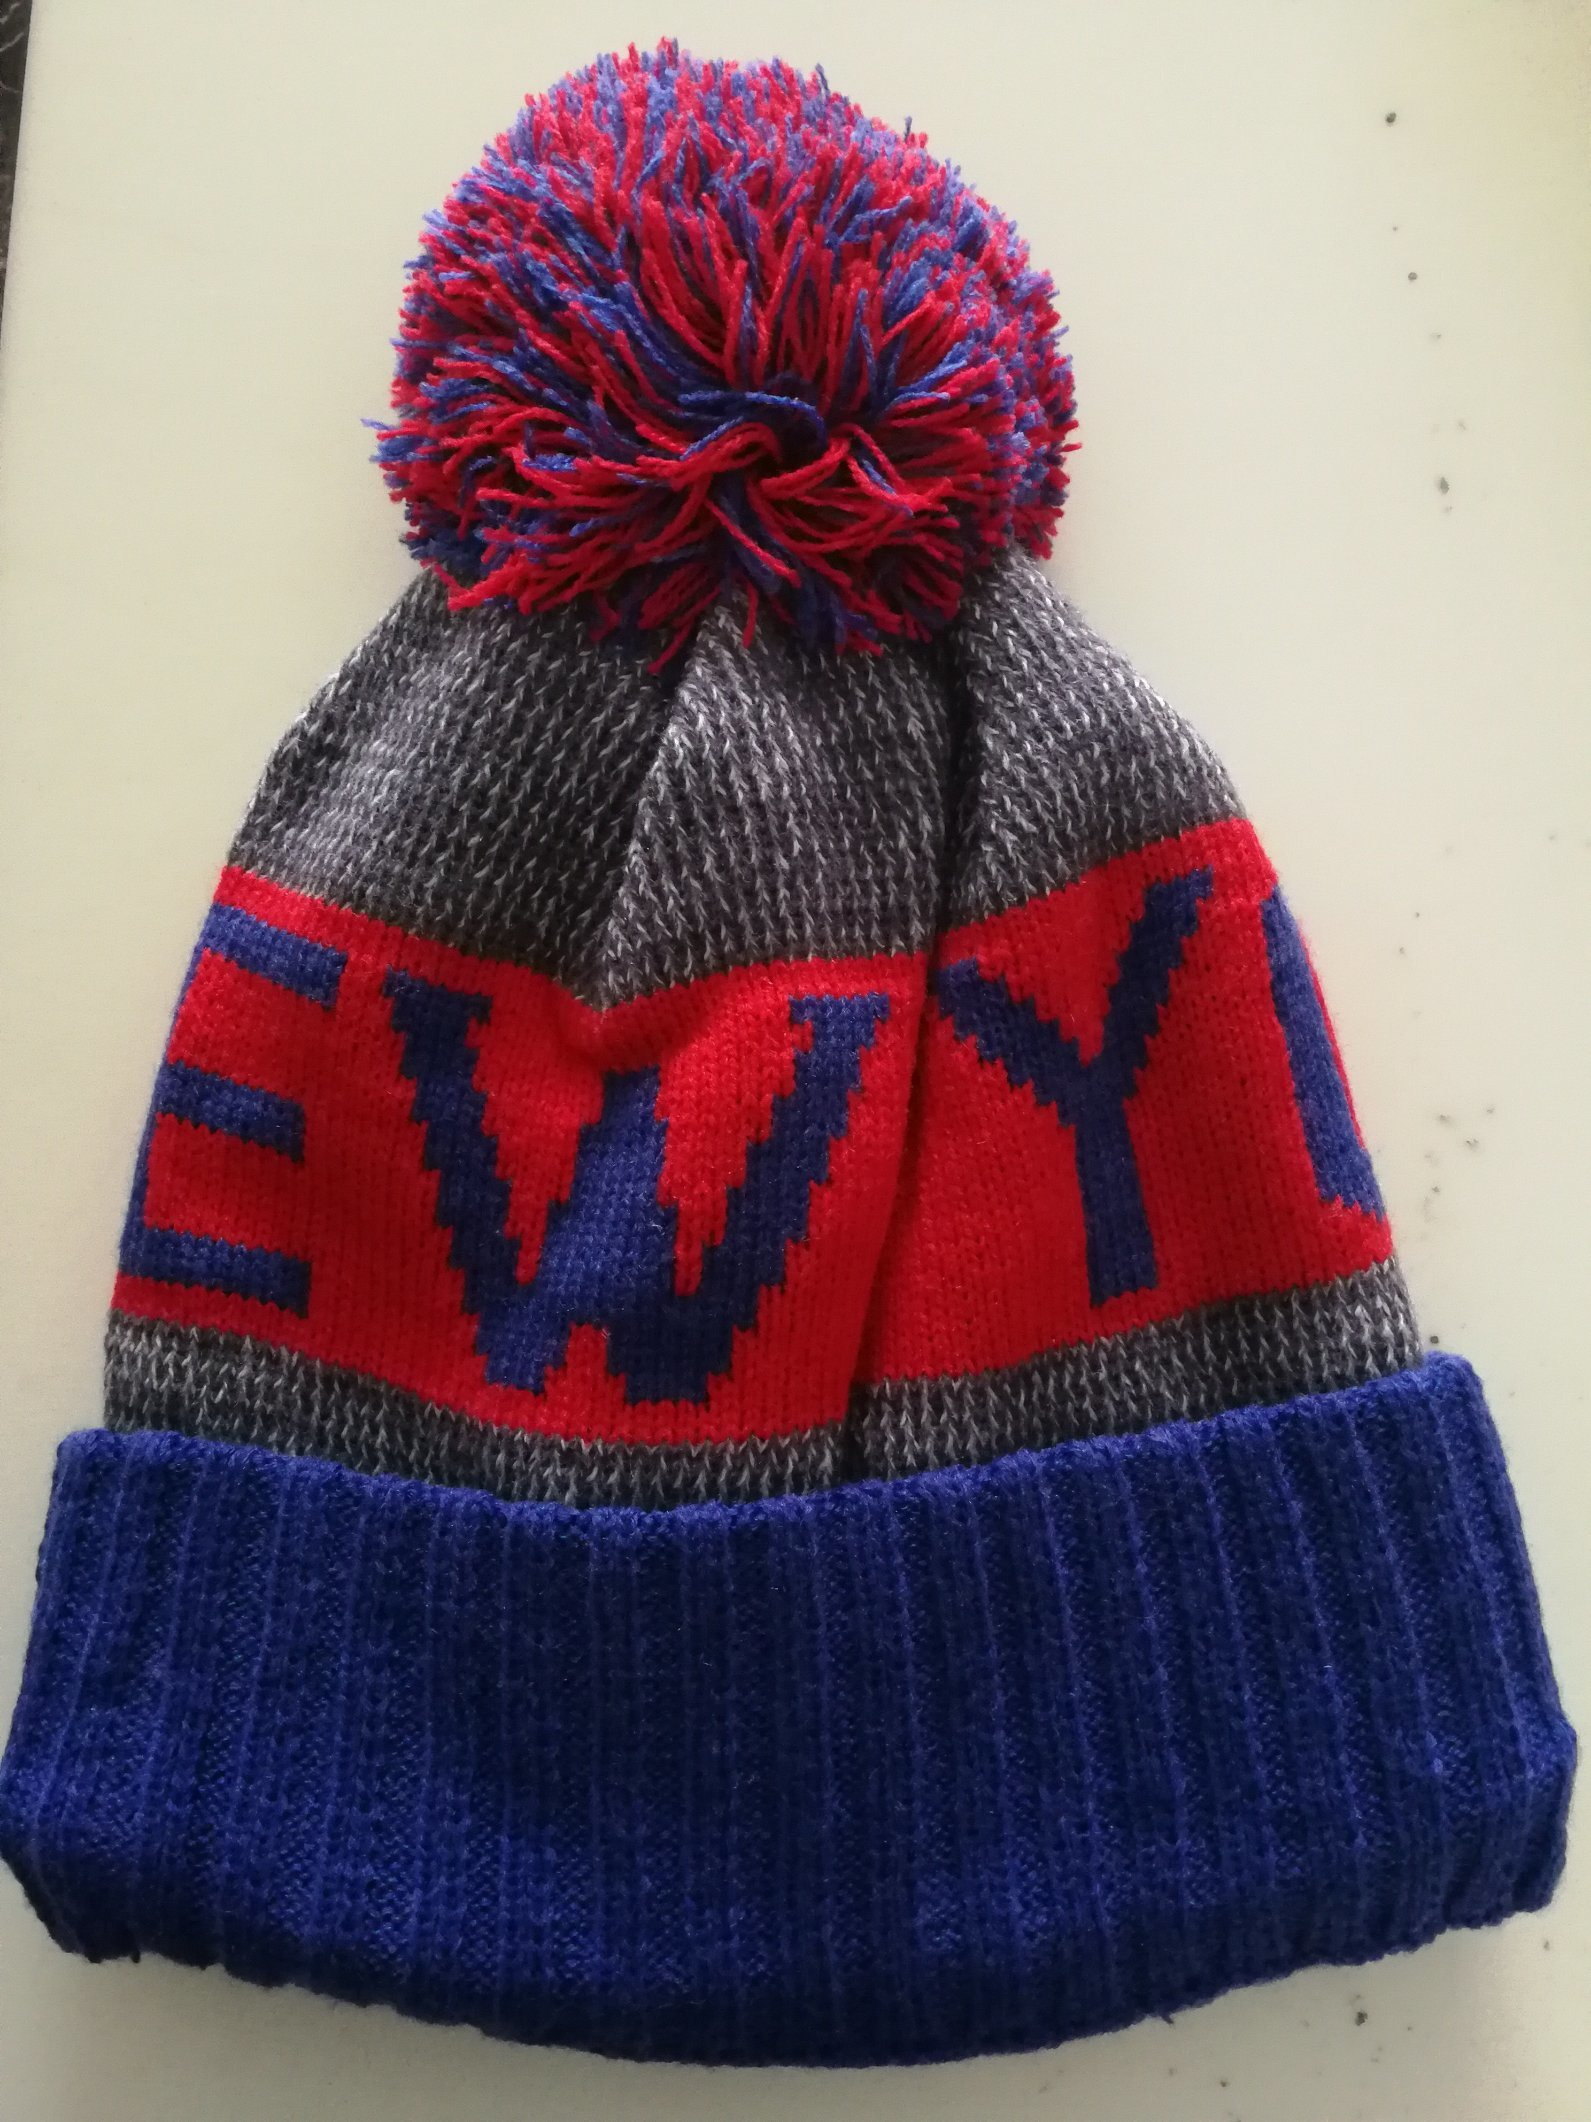 35e769315 [Hot Item] USA Football Team New York Warm Winter Fashion Cap Hip-Hop Knit  Beanie Hats Women′s Men′s Hat